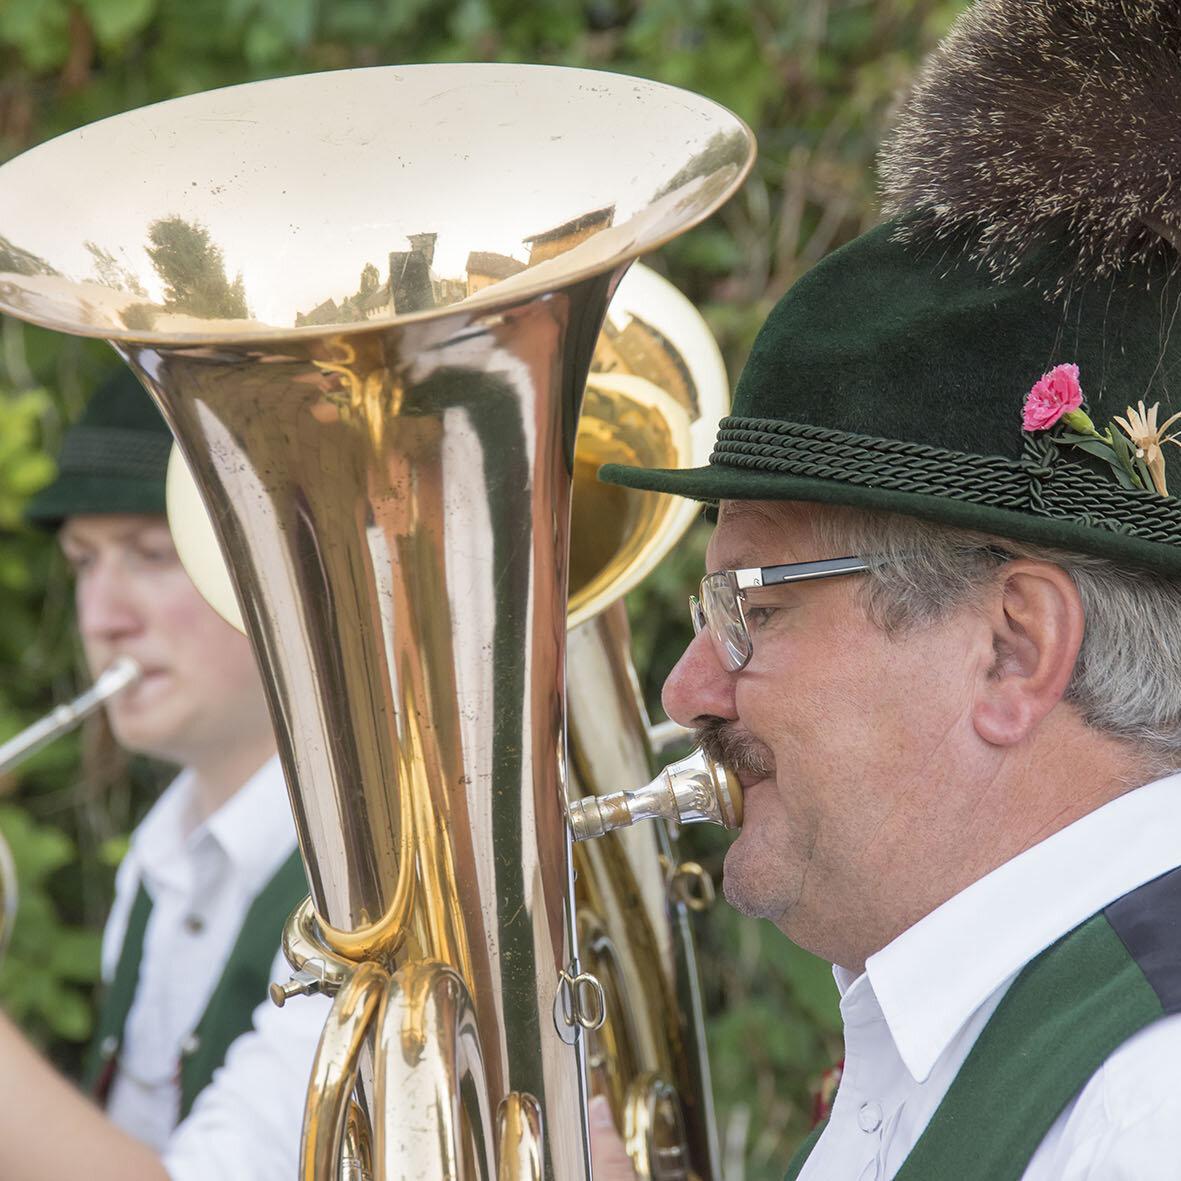 Muttertagskonzert der Musikkapelle Aufham. Beginn wird noch bekannt gegeben.